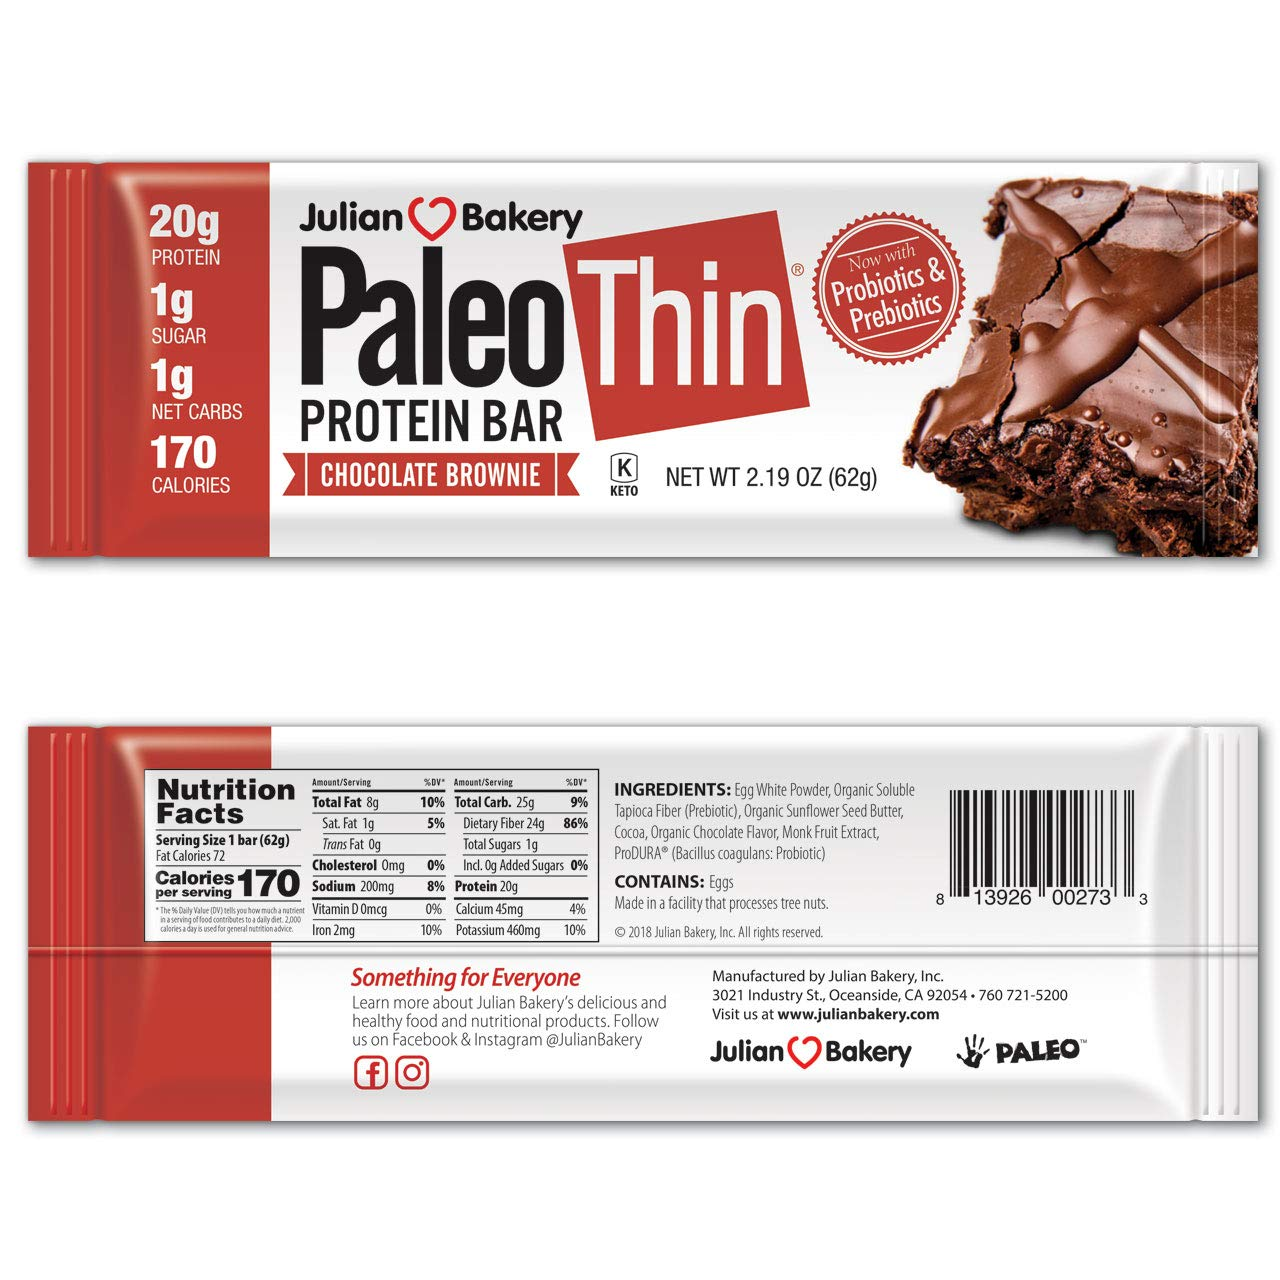 Julian Bakery Paleo Thin Protein Bars Chocolate Brownie Gluten Free